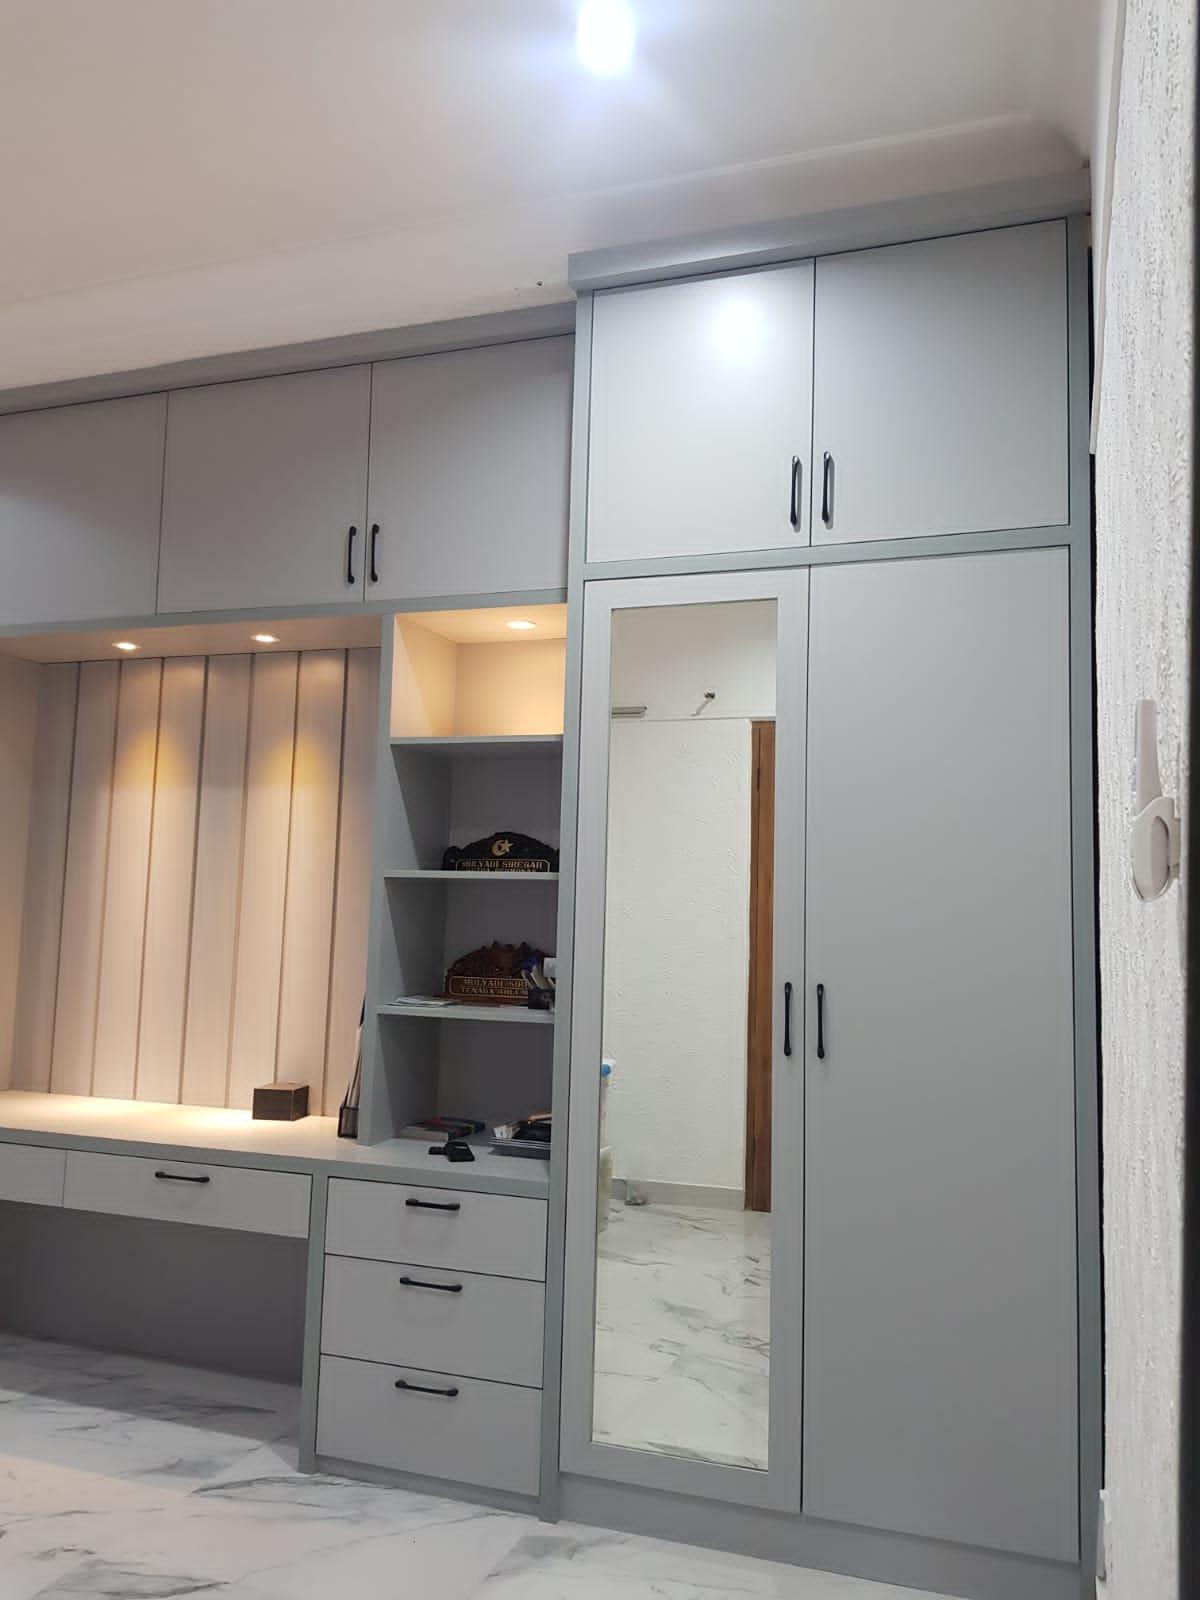 Project Belia Kitchen Set - Lemari Serbaguna - Pondok Indah - Ibu Tyaimage00004